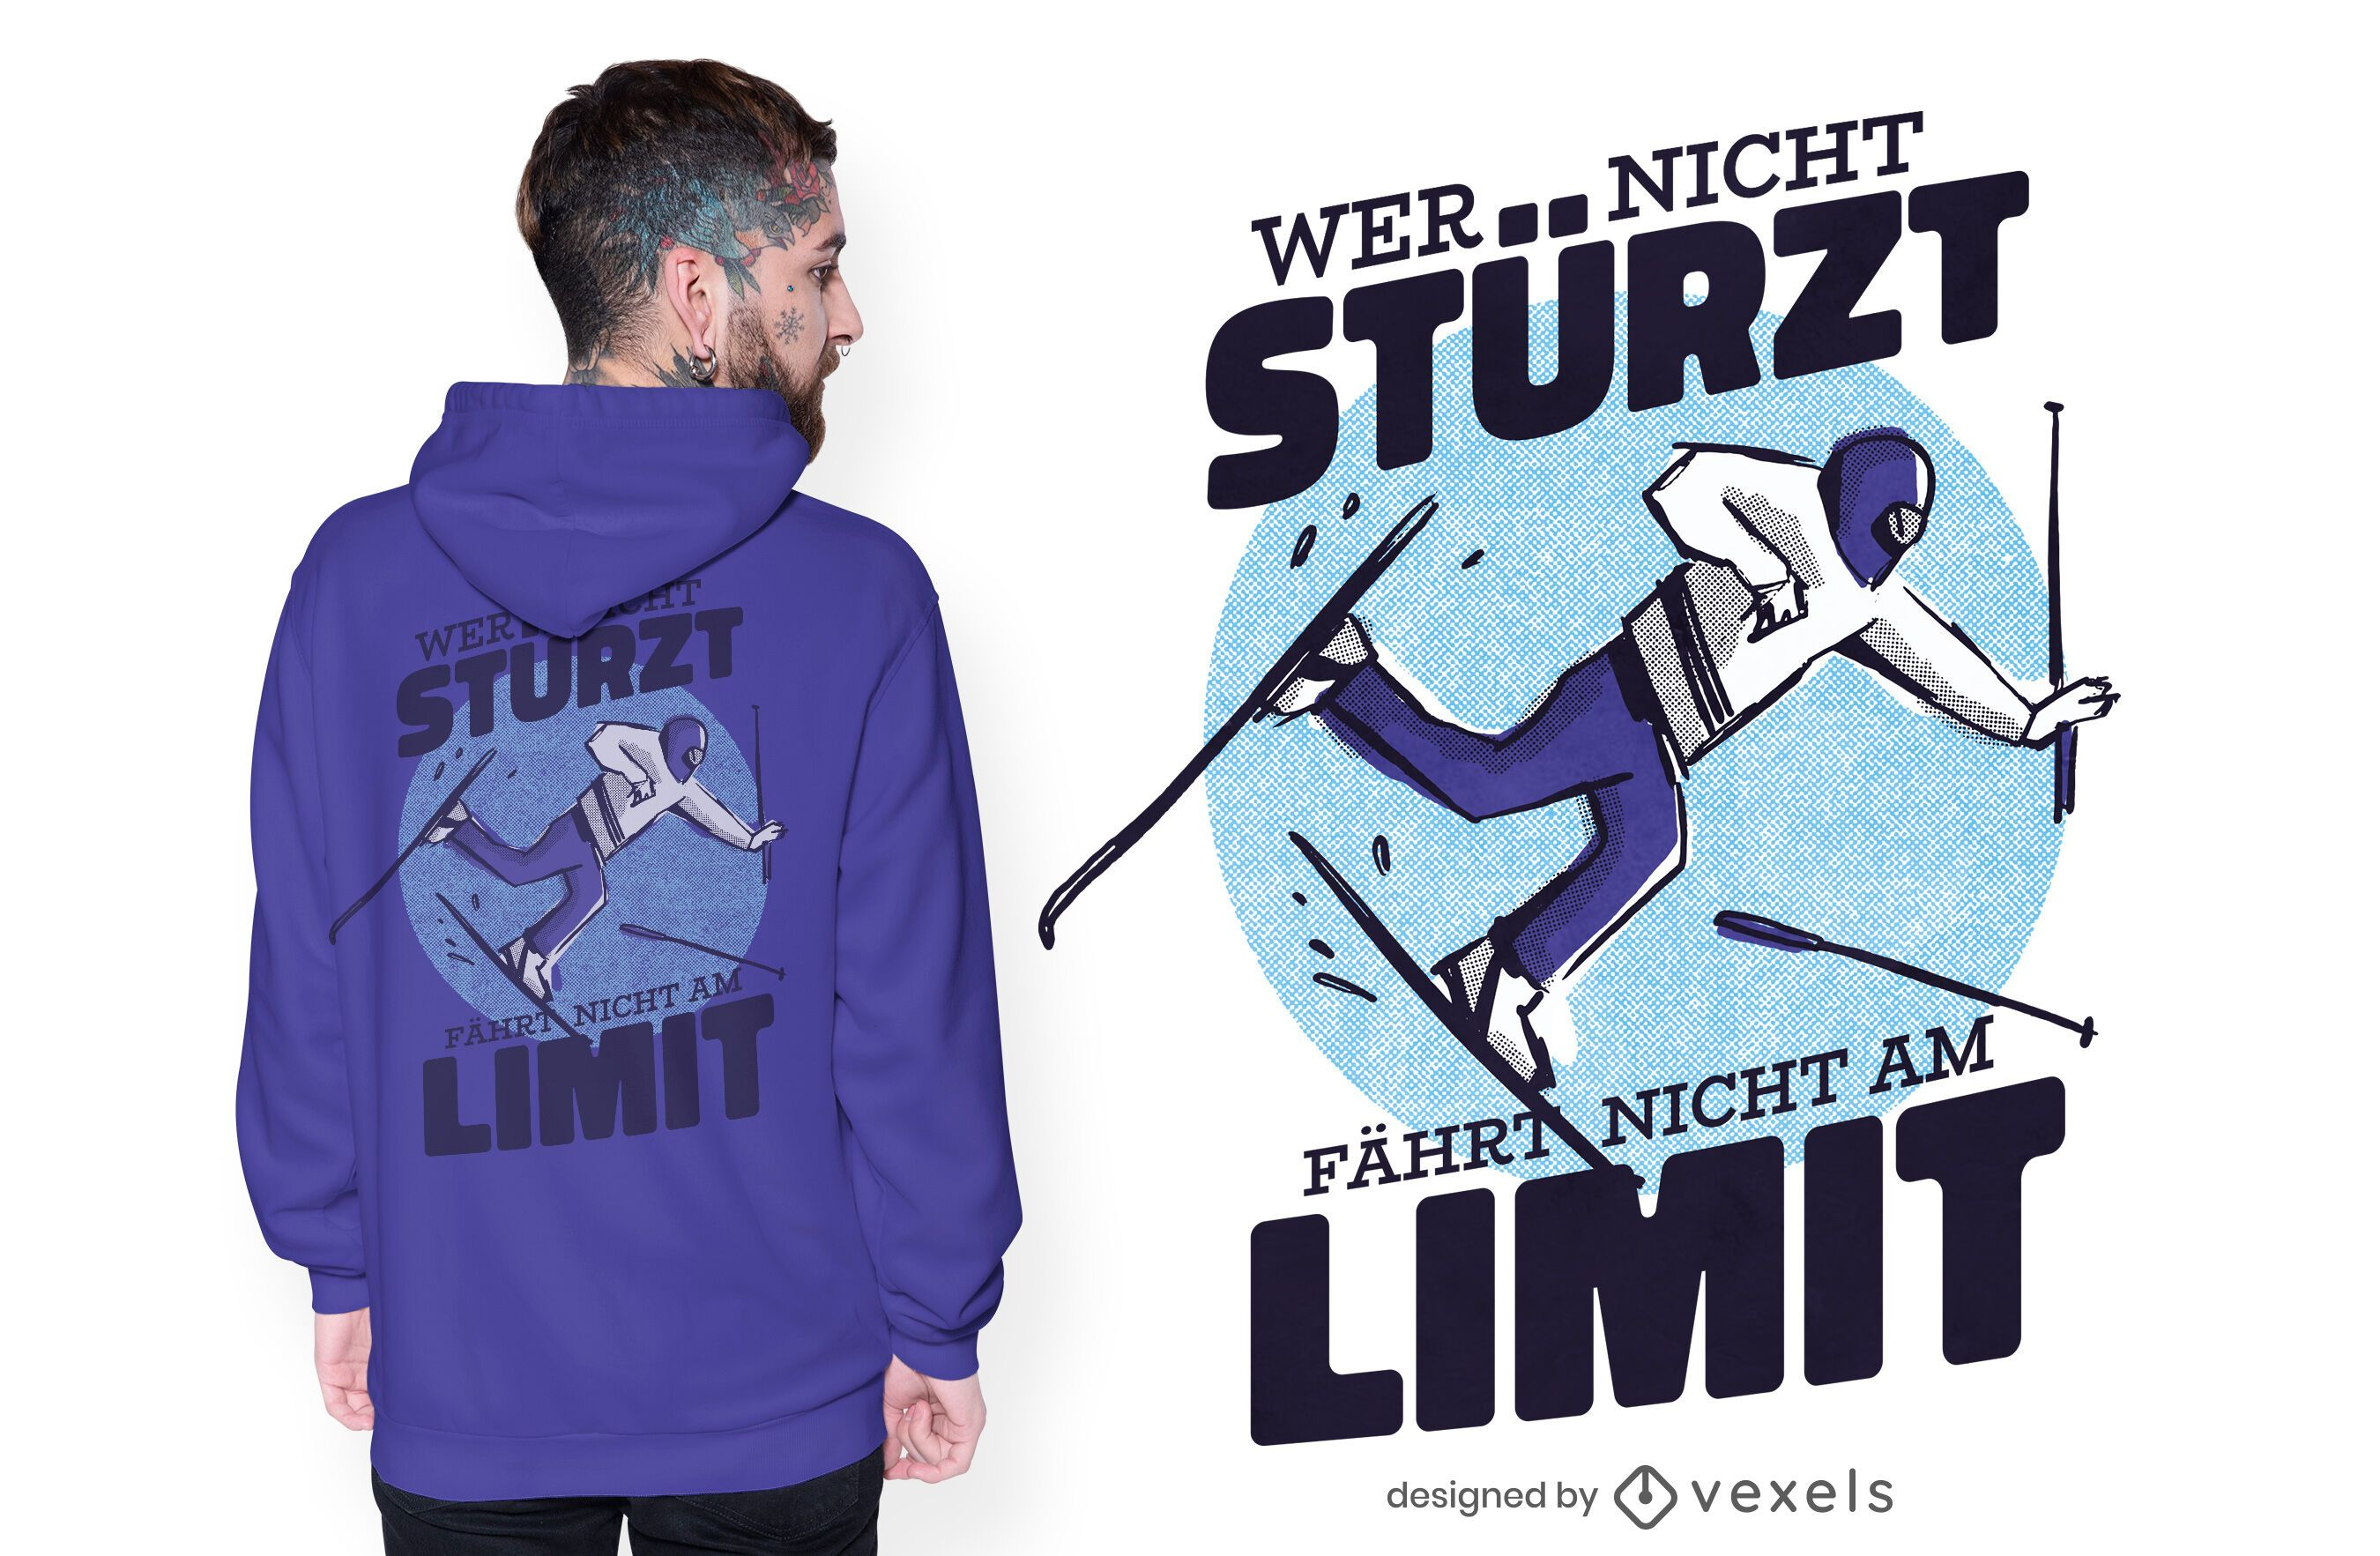 If you don't fall t-shirt design